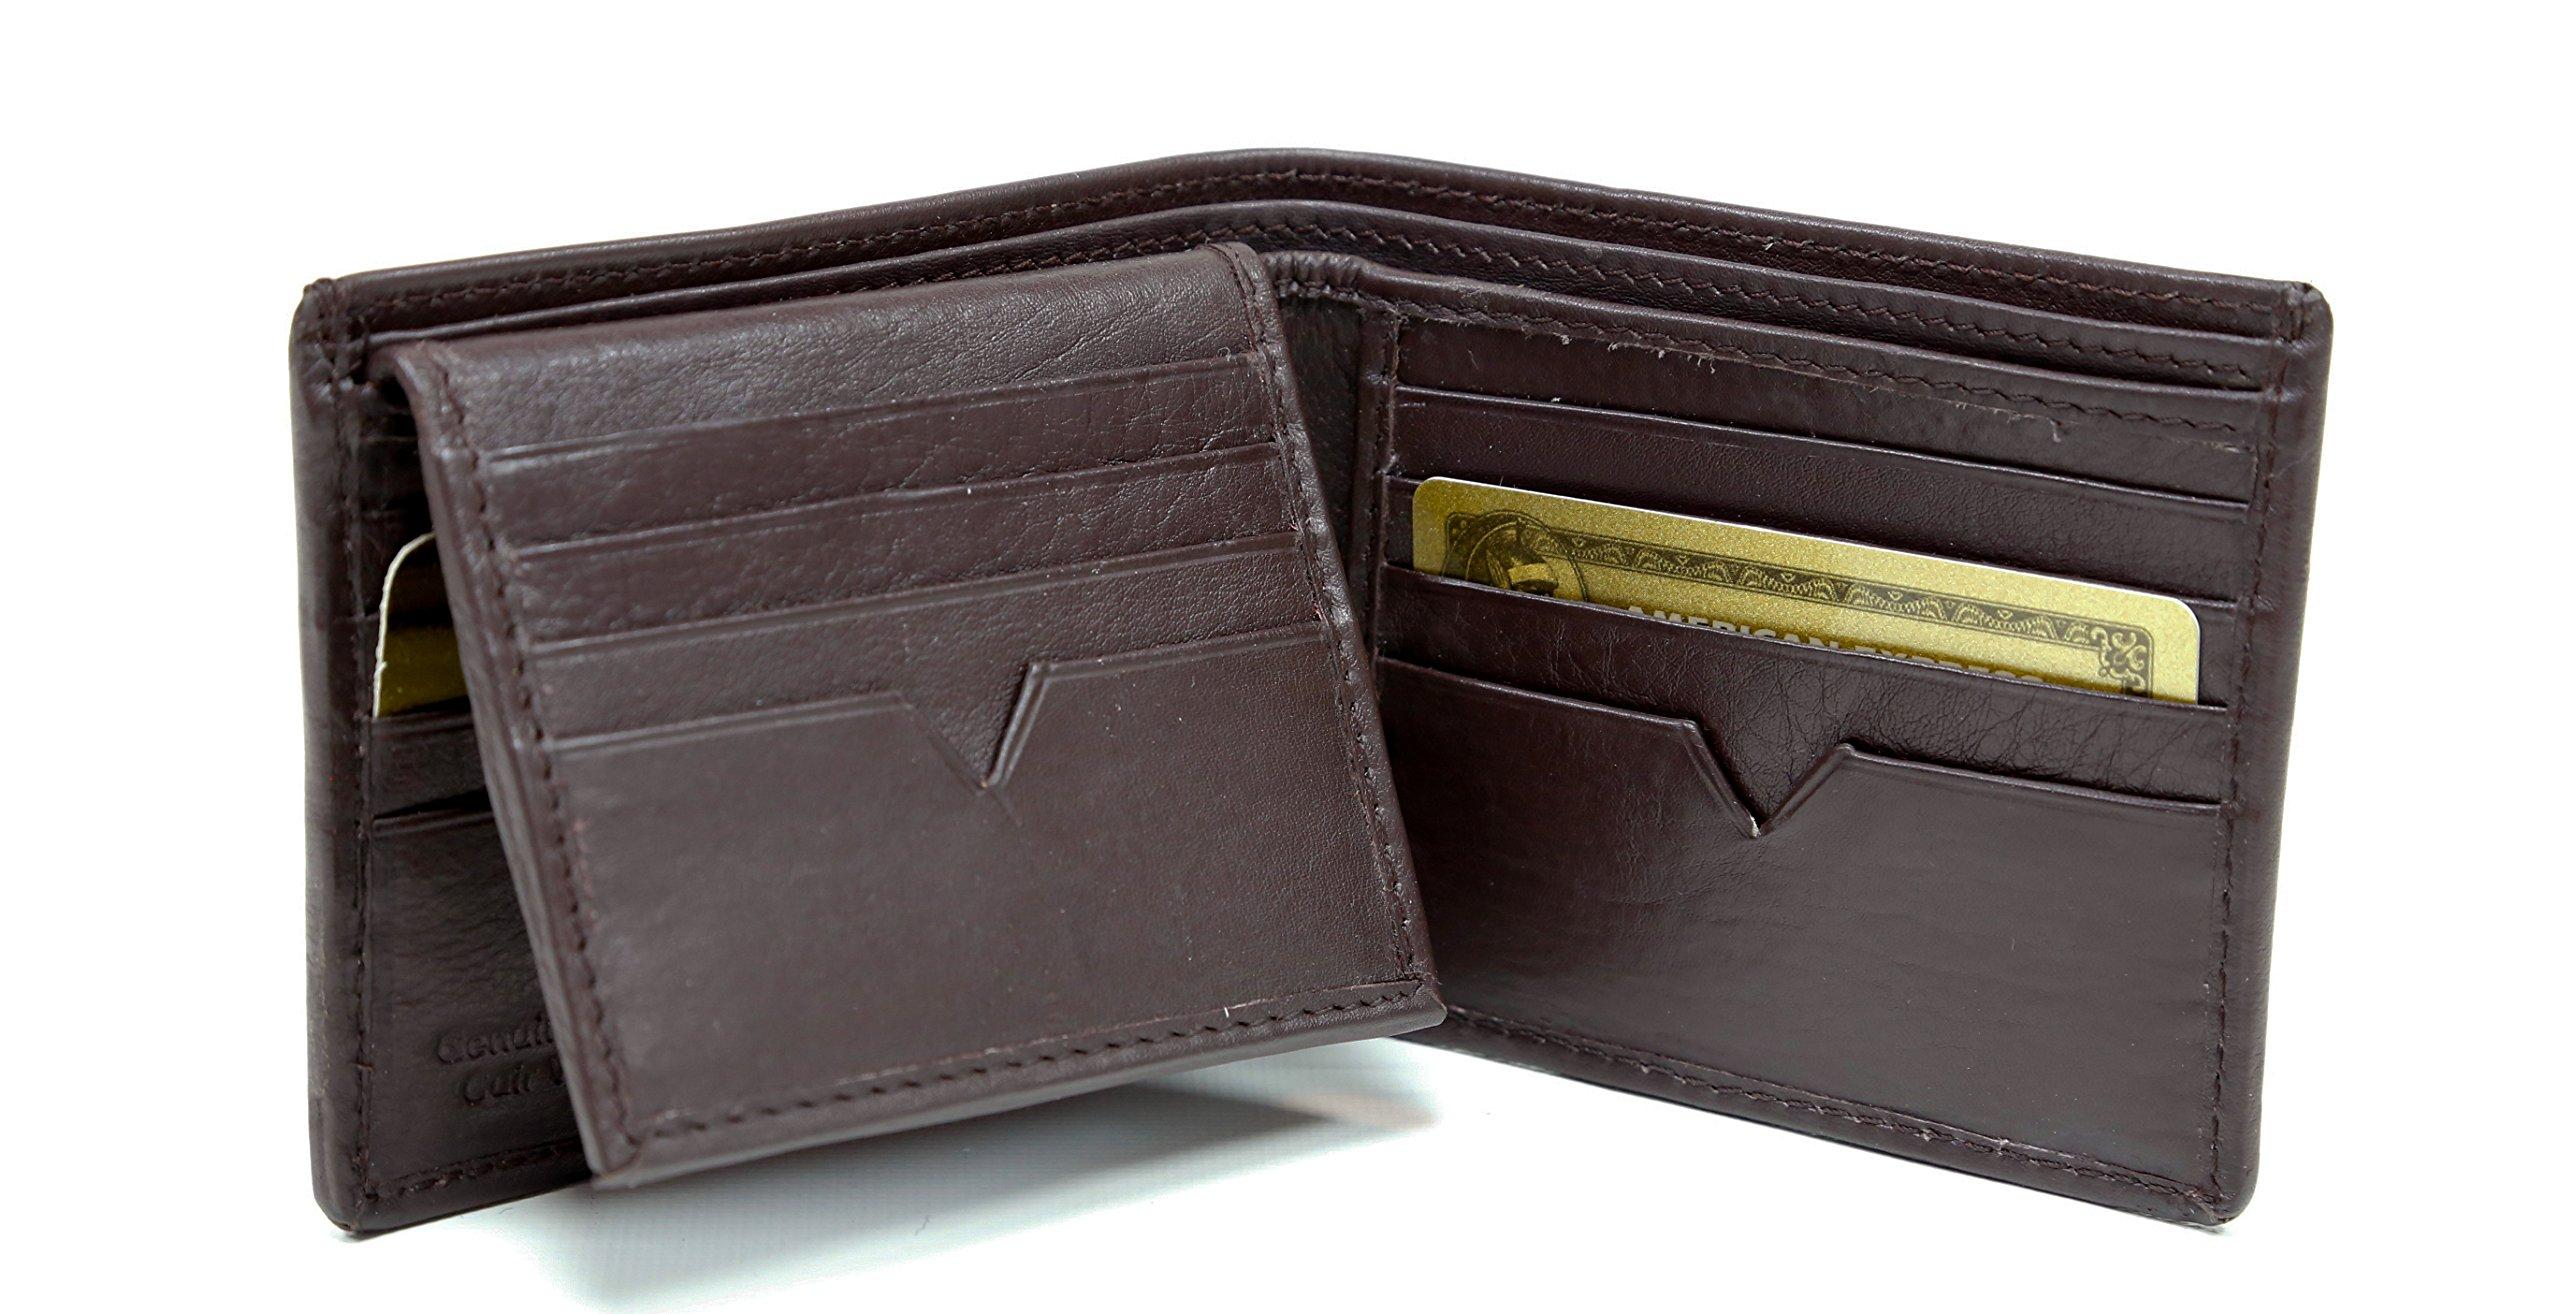 Ashlin Genuine Leather 16 Credit Card Slots Wallet, Dark Brown (756-18-02) by Ashlin®